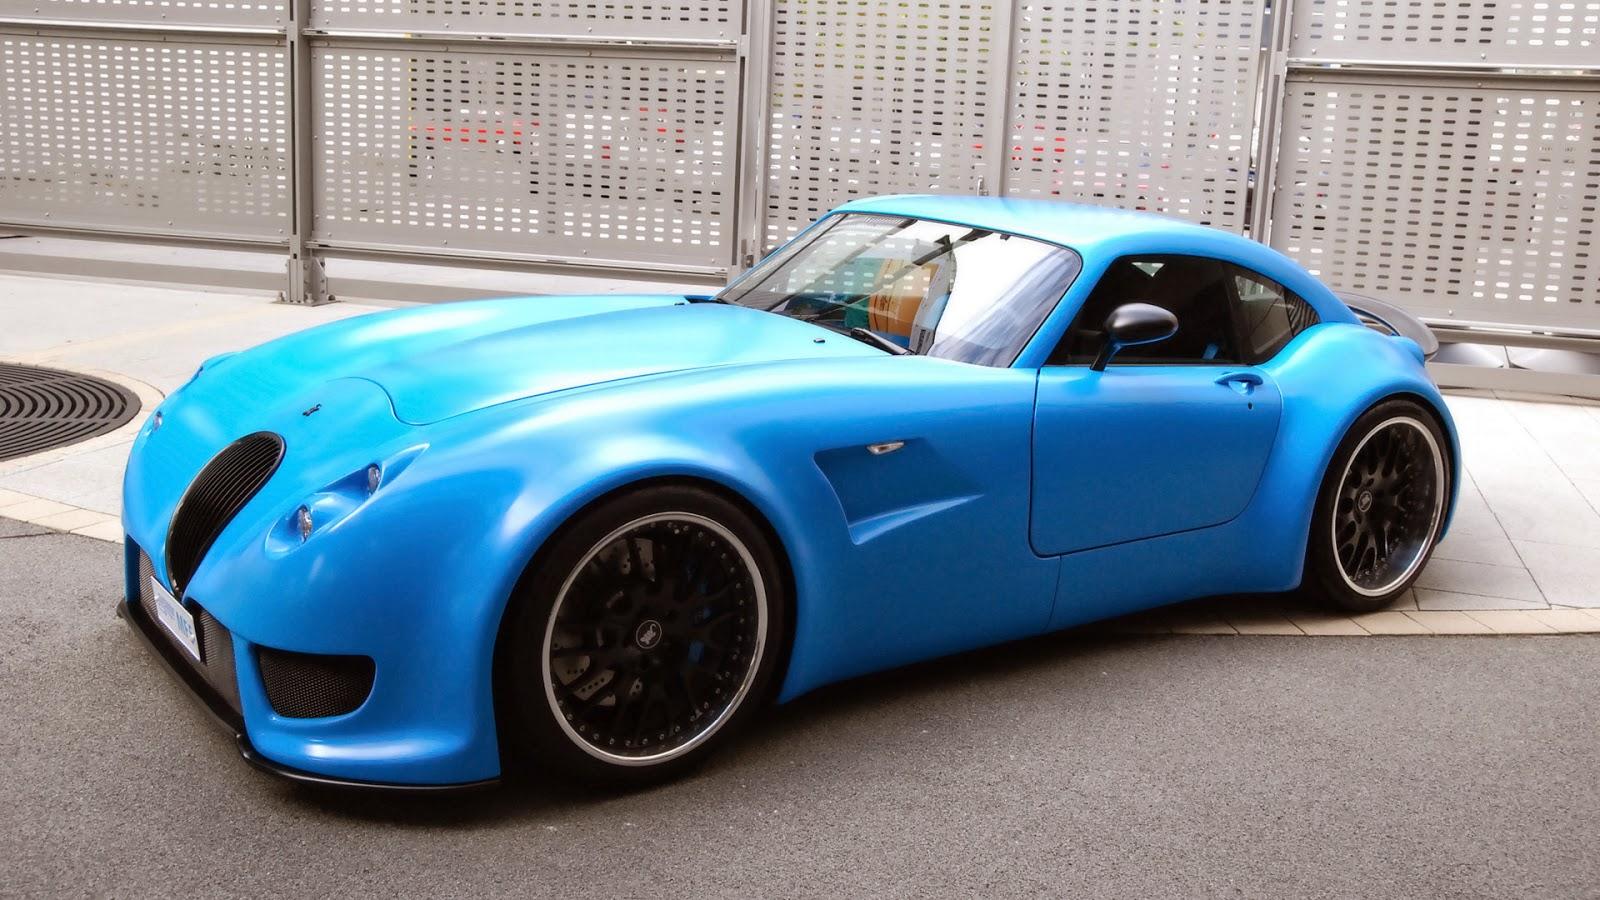 Beautiful Blue Cars Wallpapers Desktop